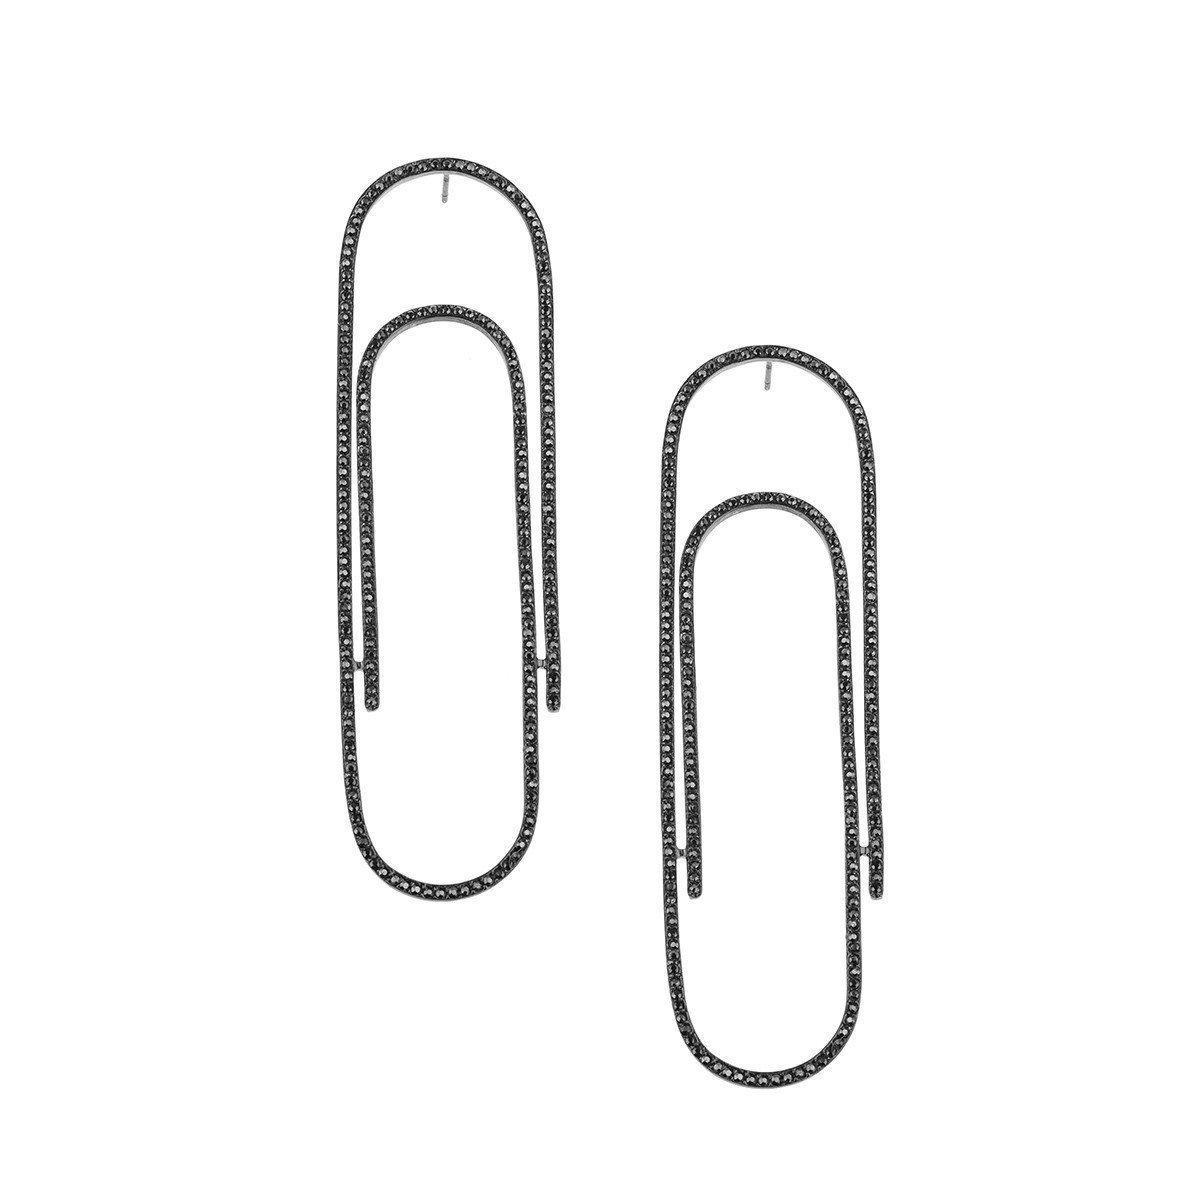 Joanna Laura Constantine Large Paper-Clip Earrings sZDTTww